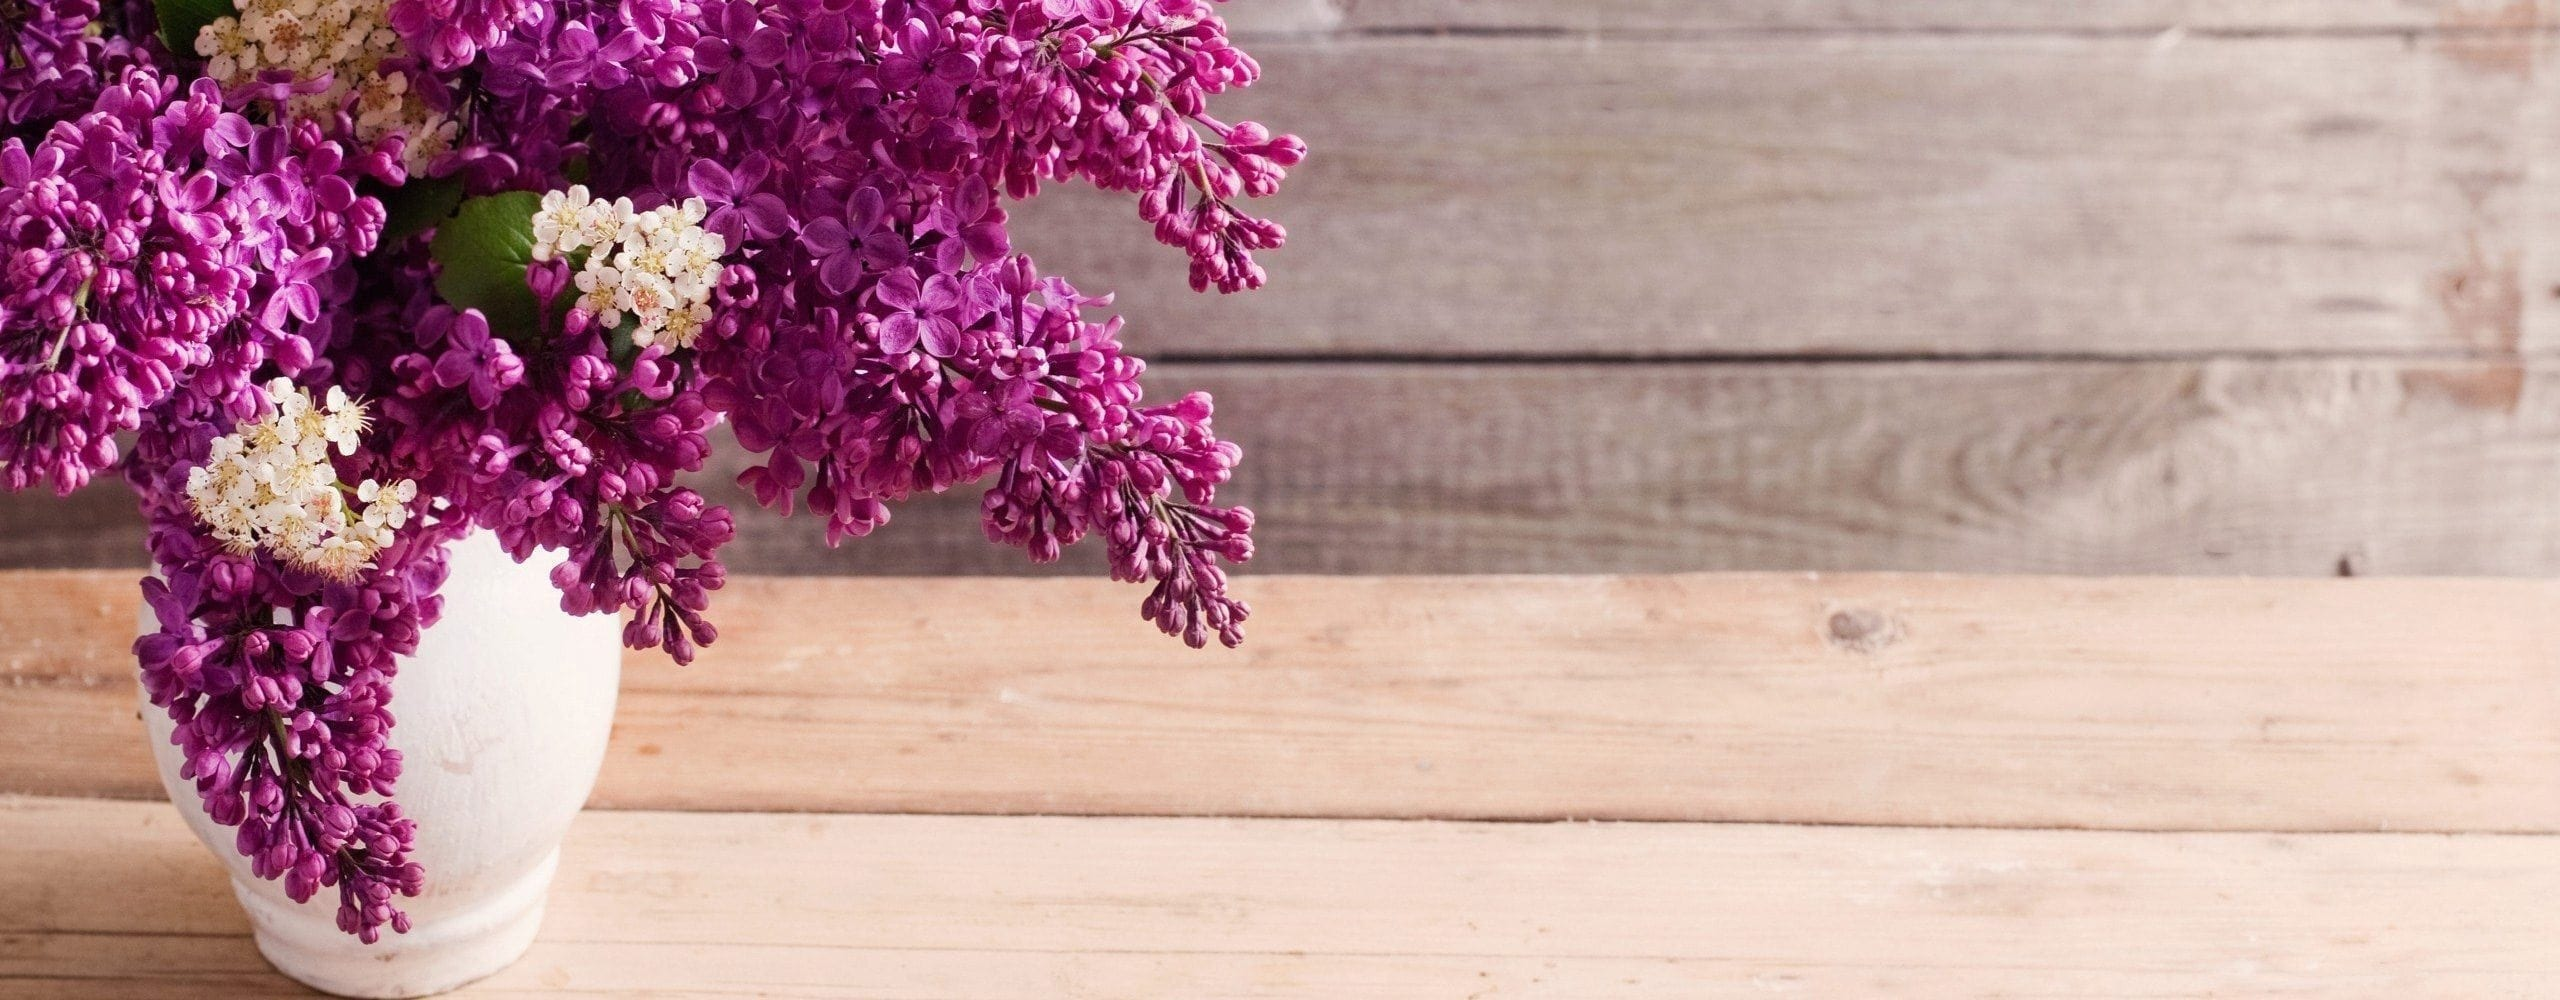 Precious Petals Florists Dublin | Buy Flowers Online | Dublin Florists